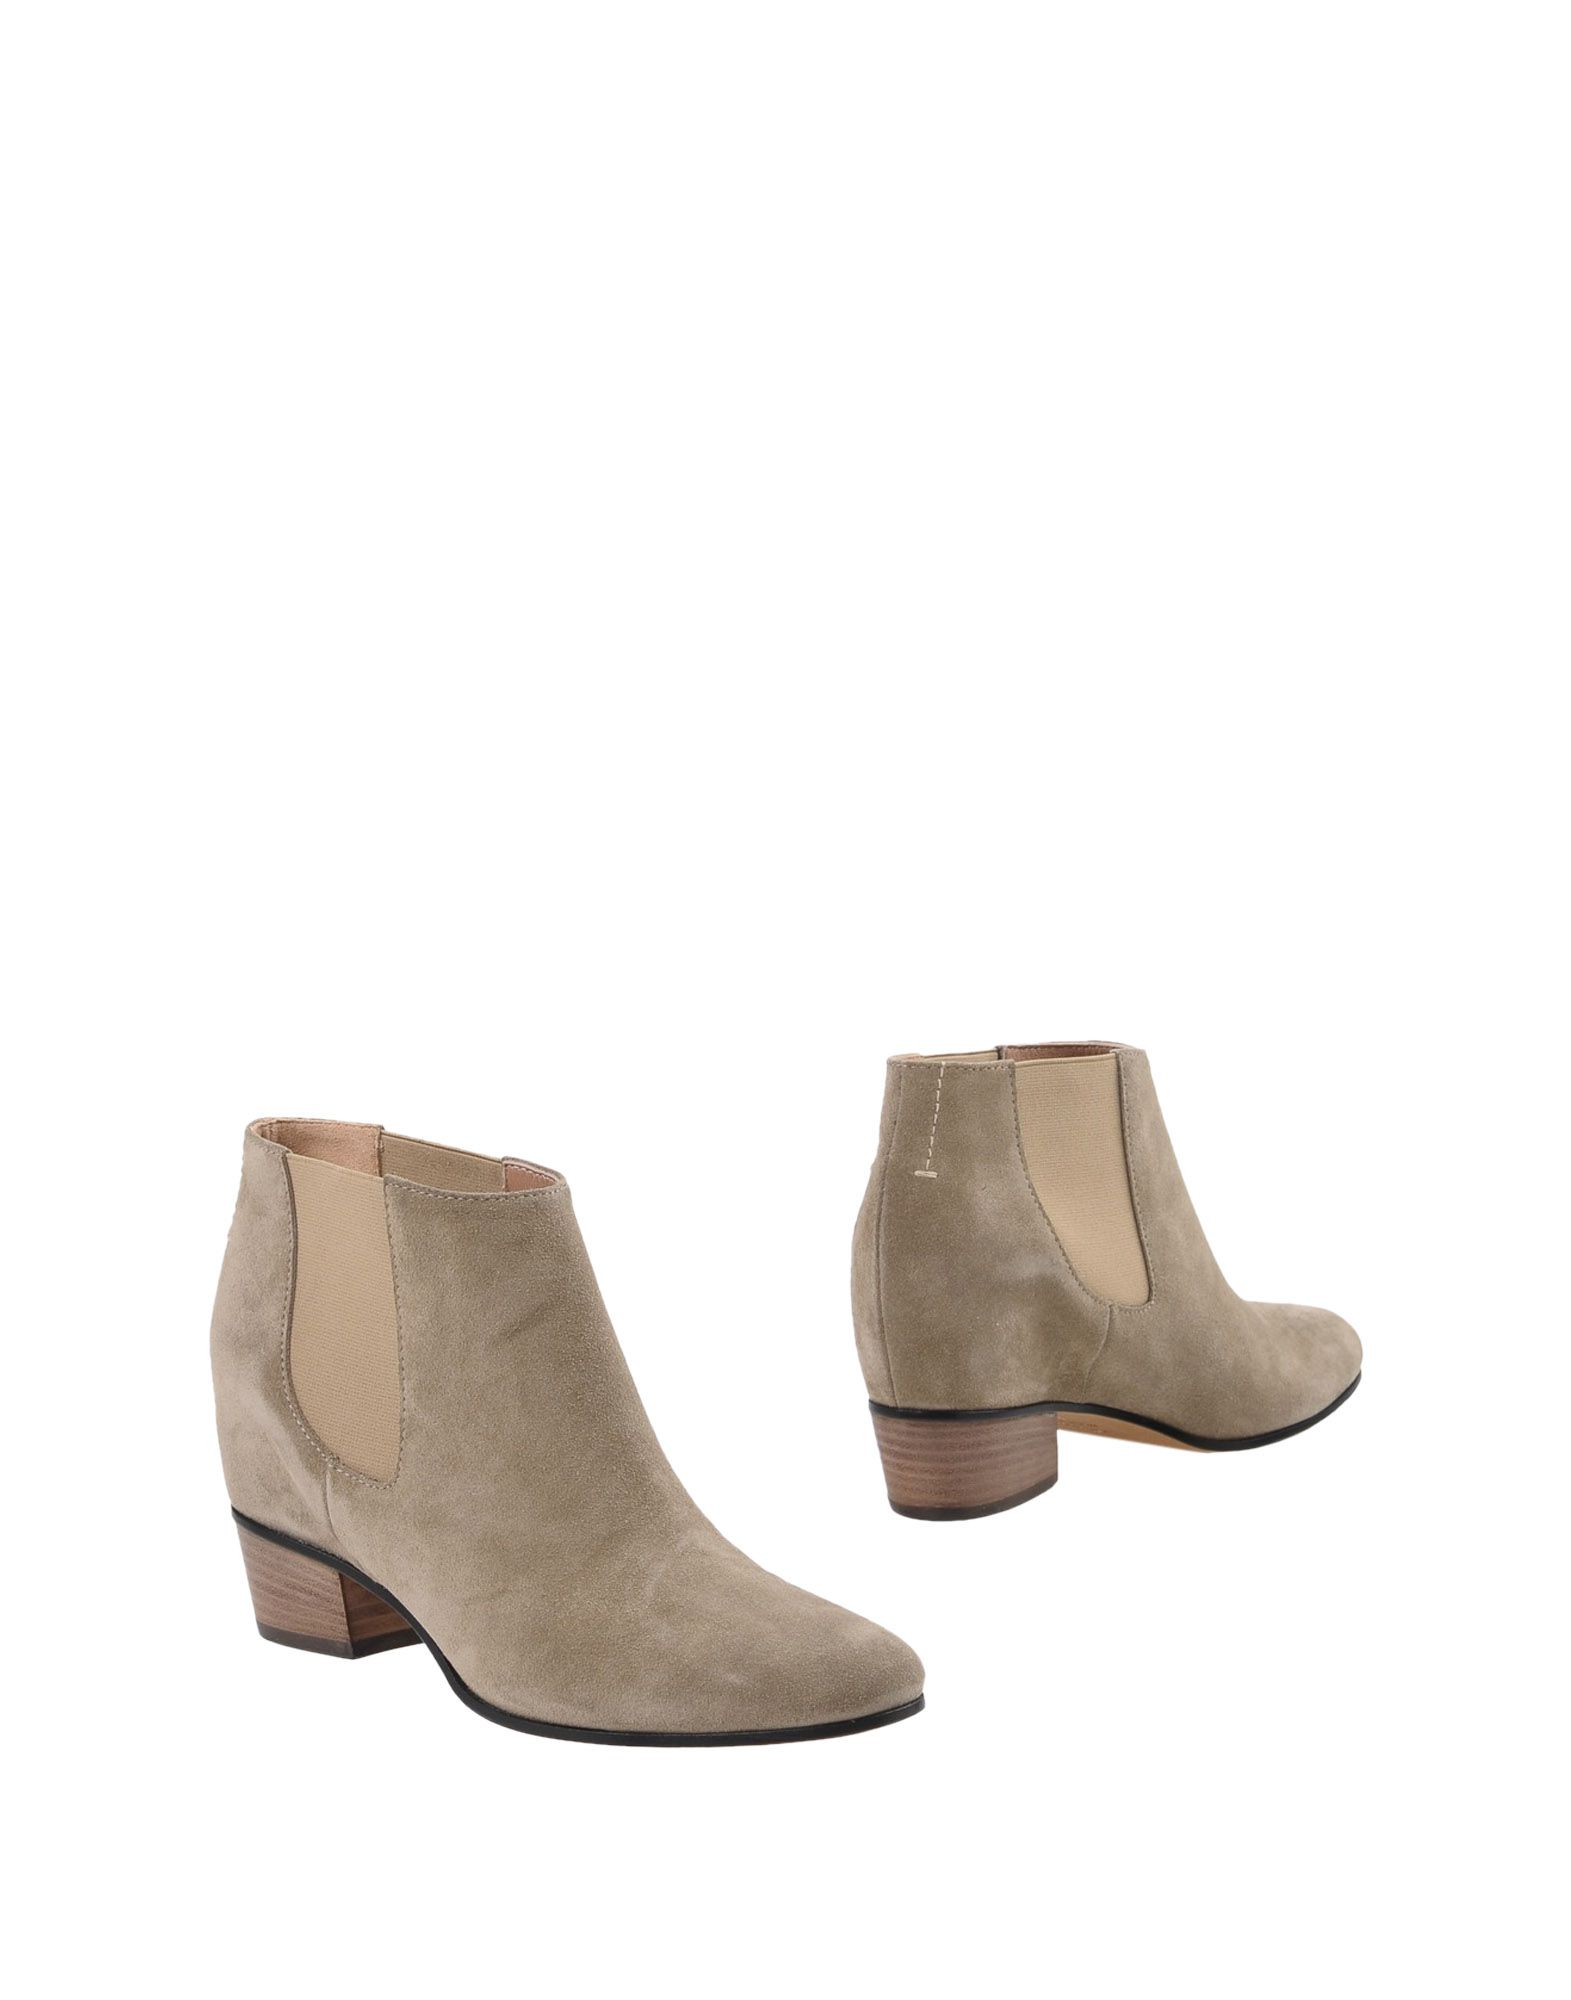 Stivaletti Golden Goose Deluxe Brand Donna - Acquista online su